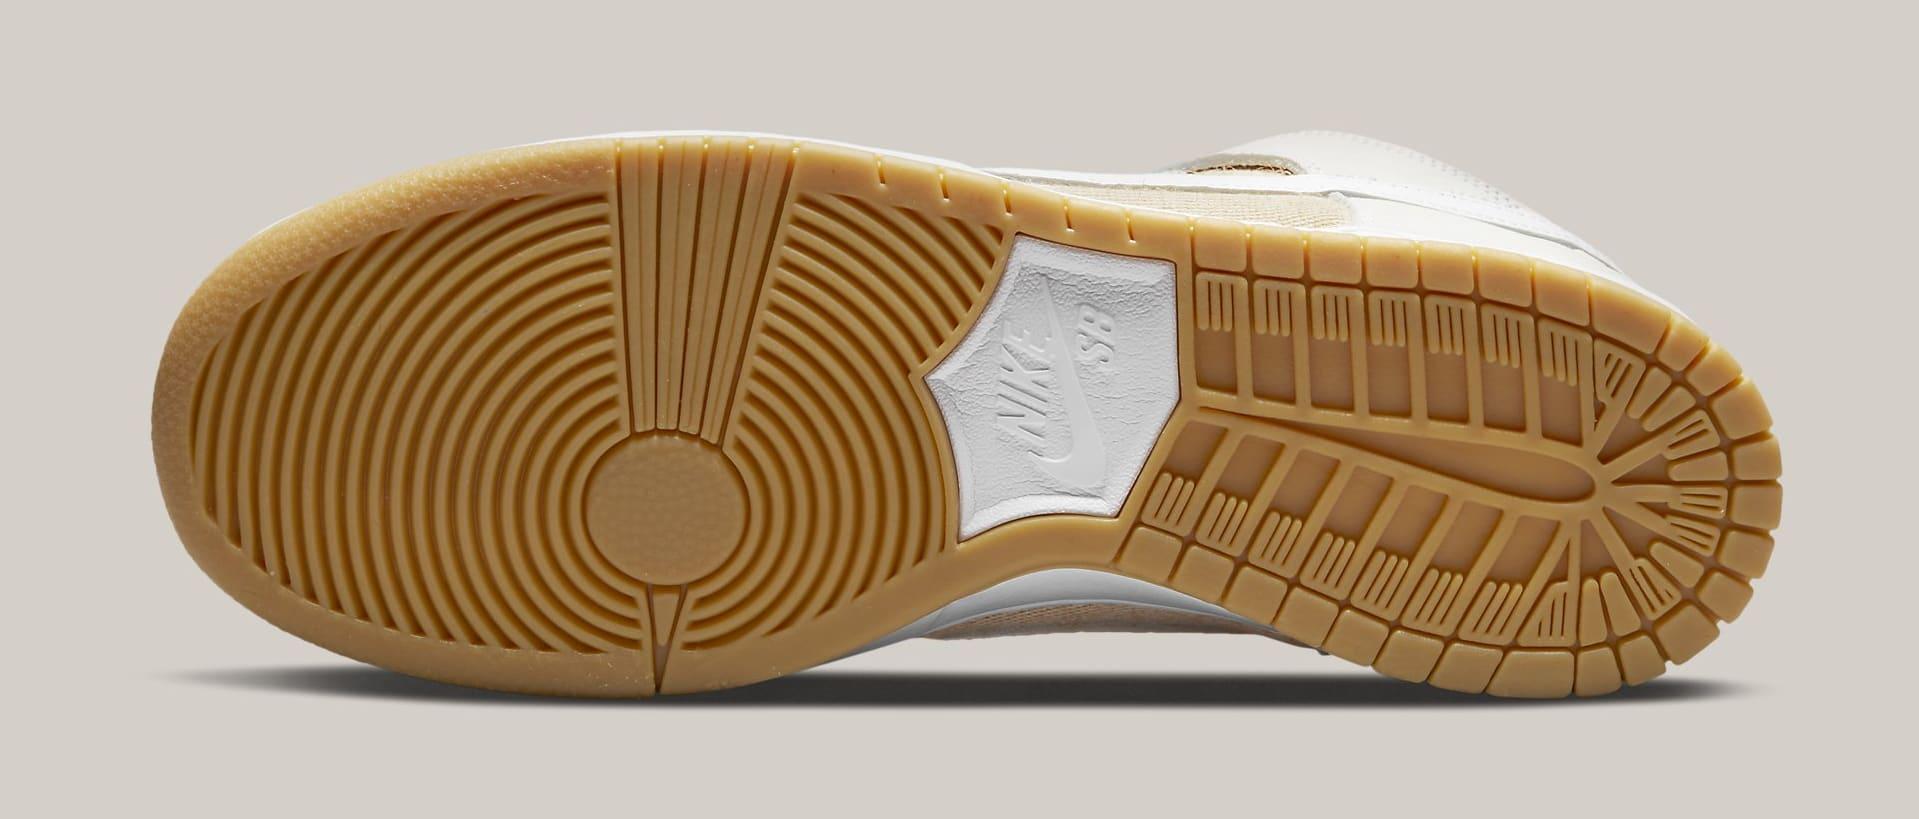 Nike SB Dunk High 'Unbleached' DA9626-100 Outsole